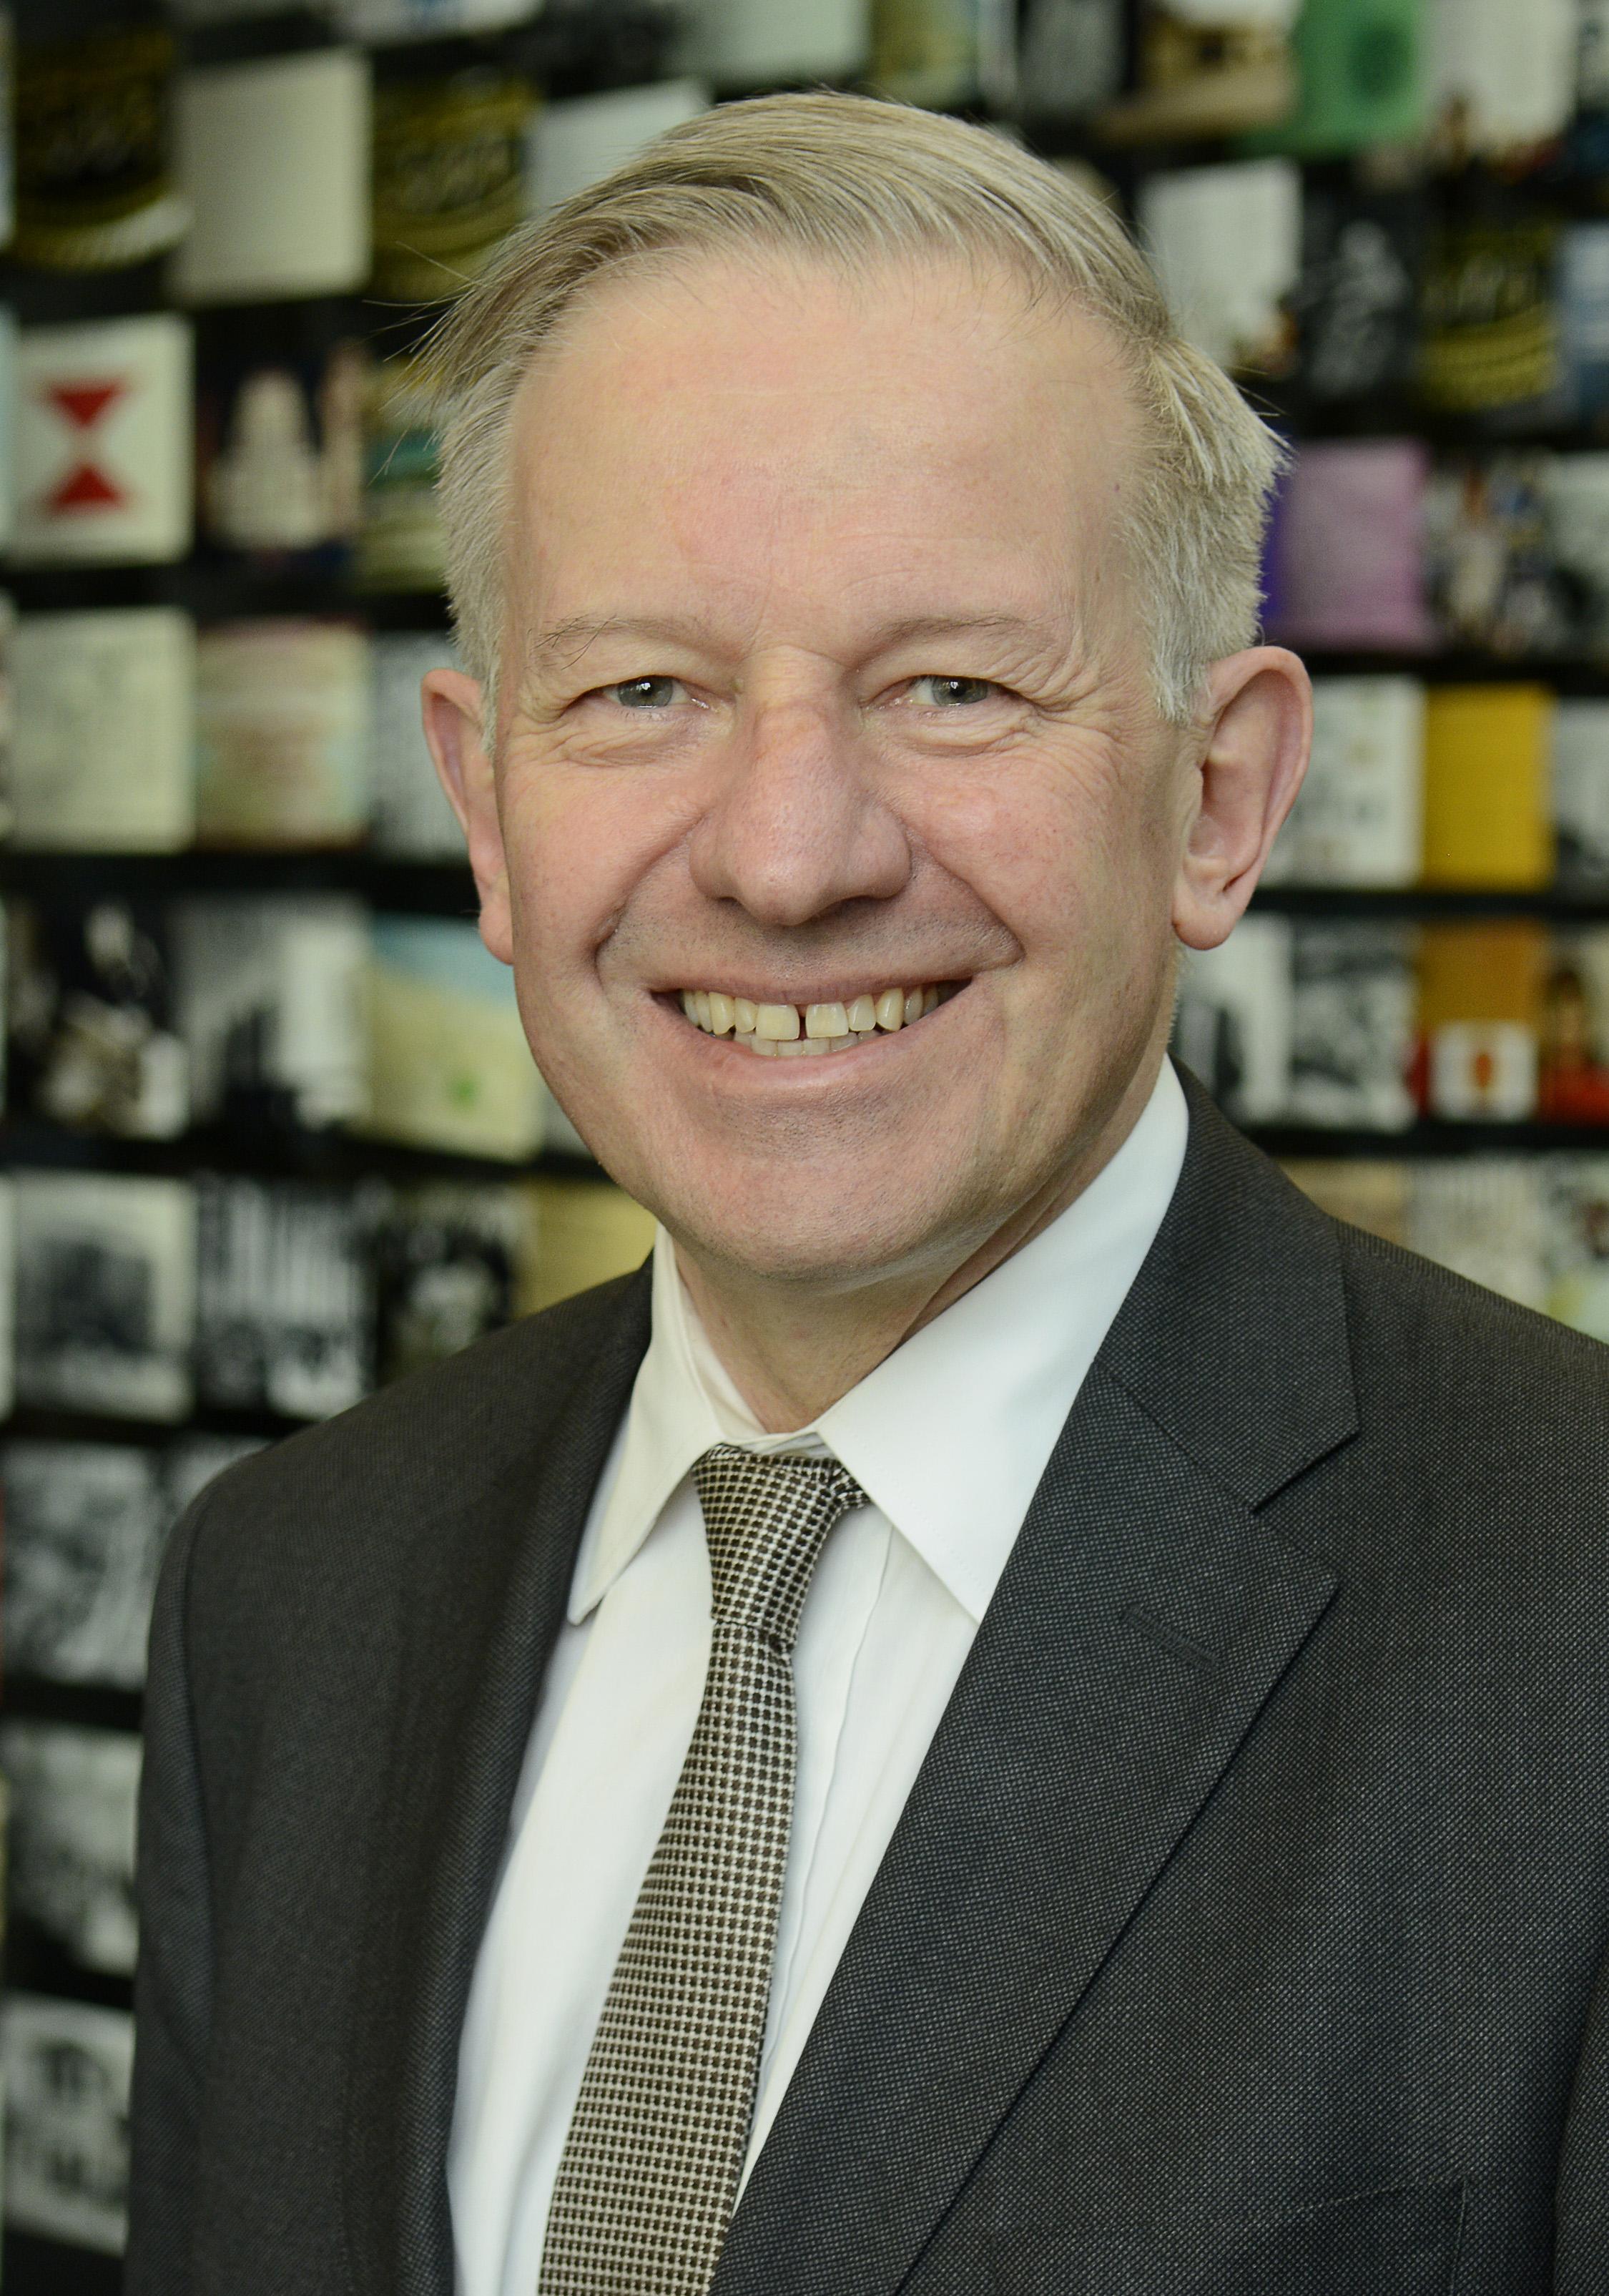 Sir Sherard Cowper-Coles KCMG LVO - Group Head of Public Affairs, HSBC Holdings plc